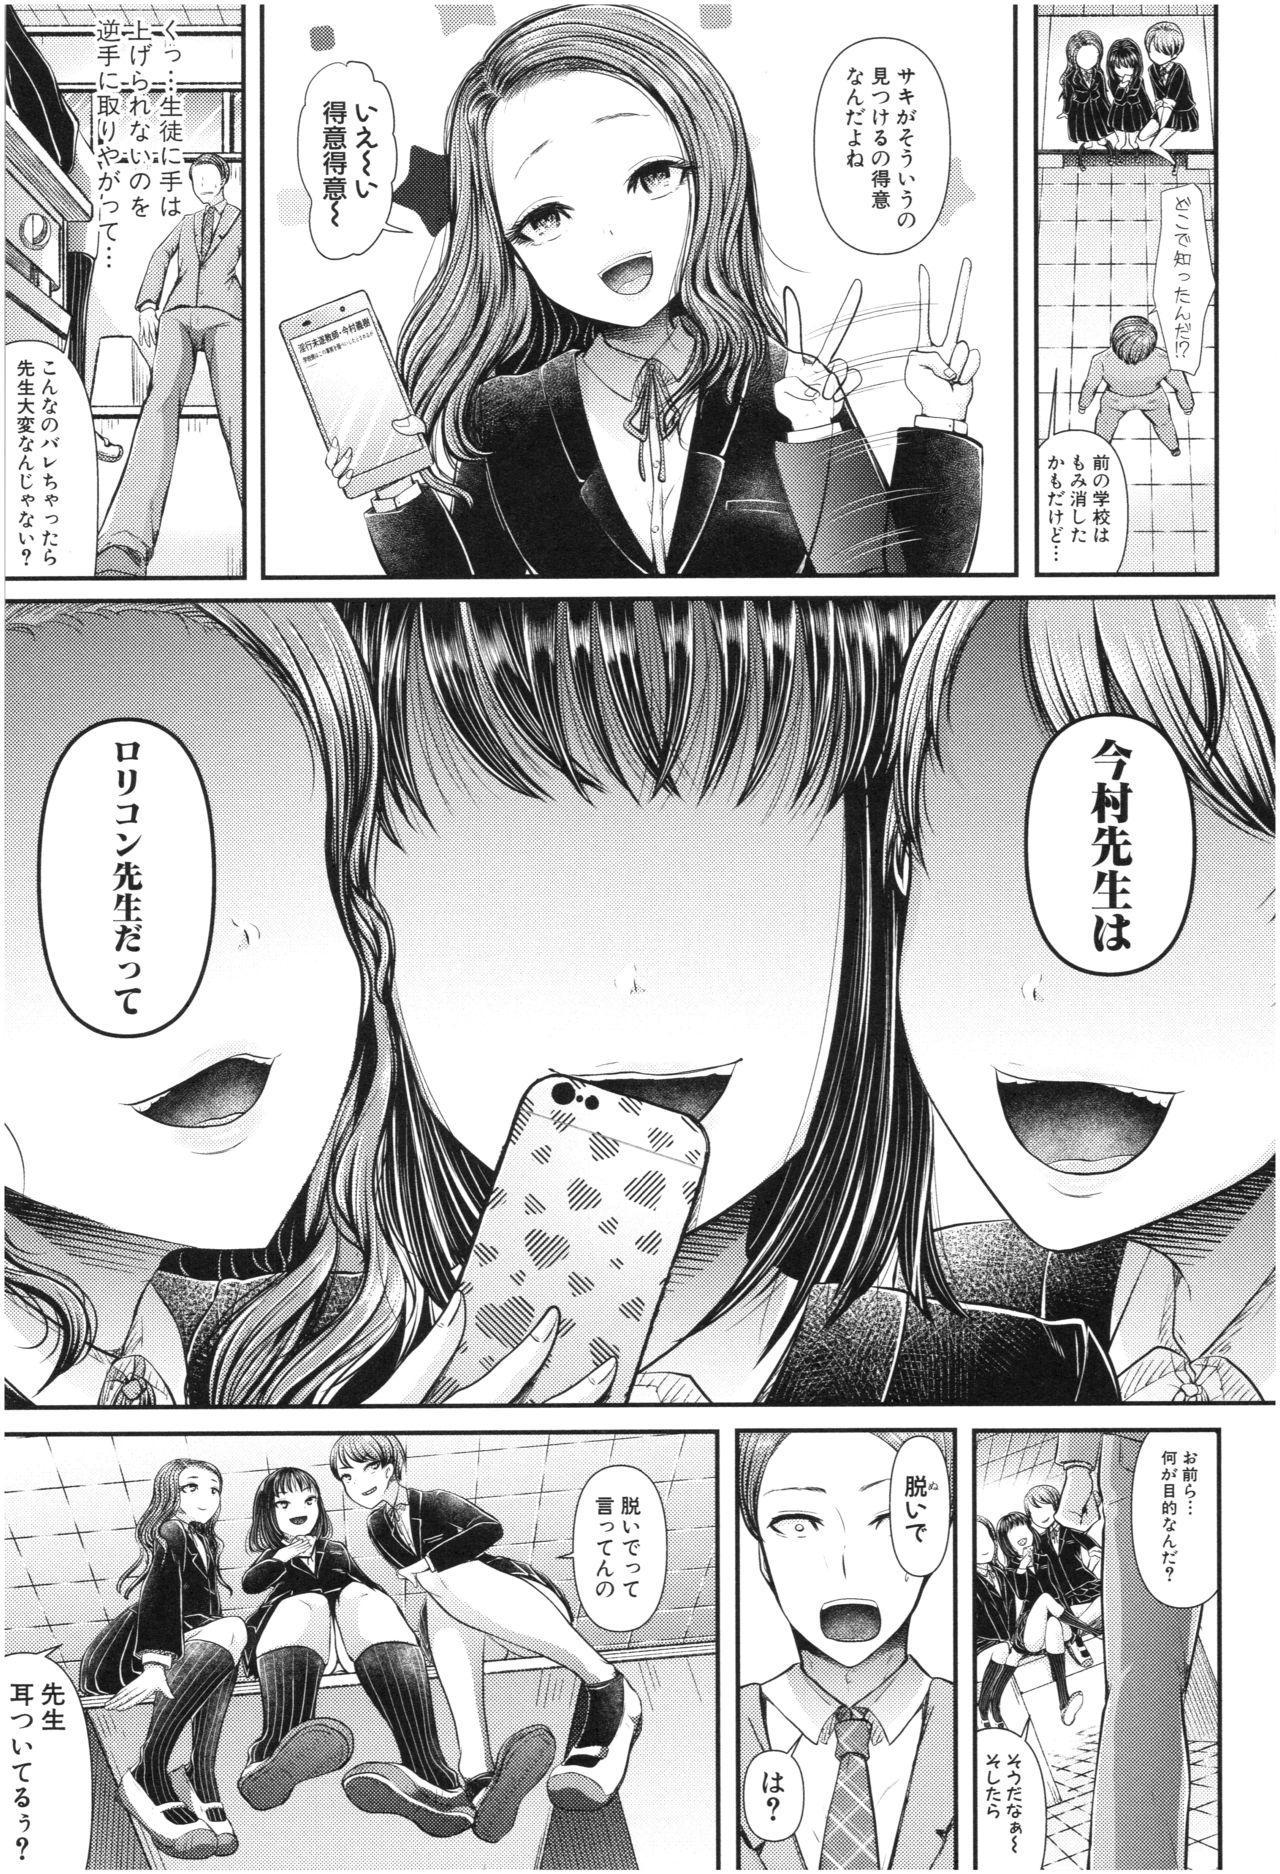 Sannenkan no Aoi Haru 13